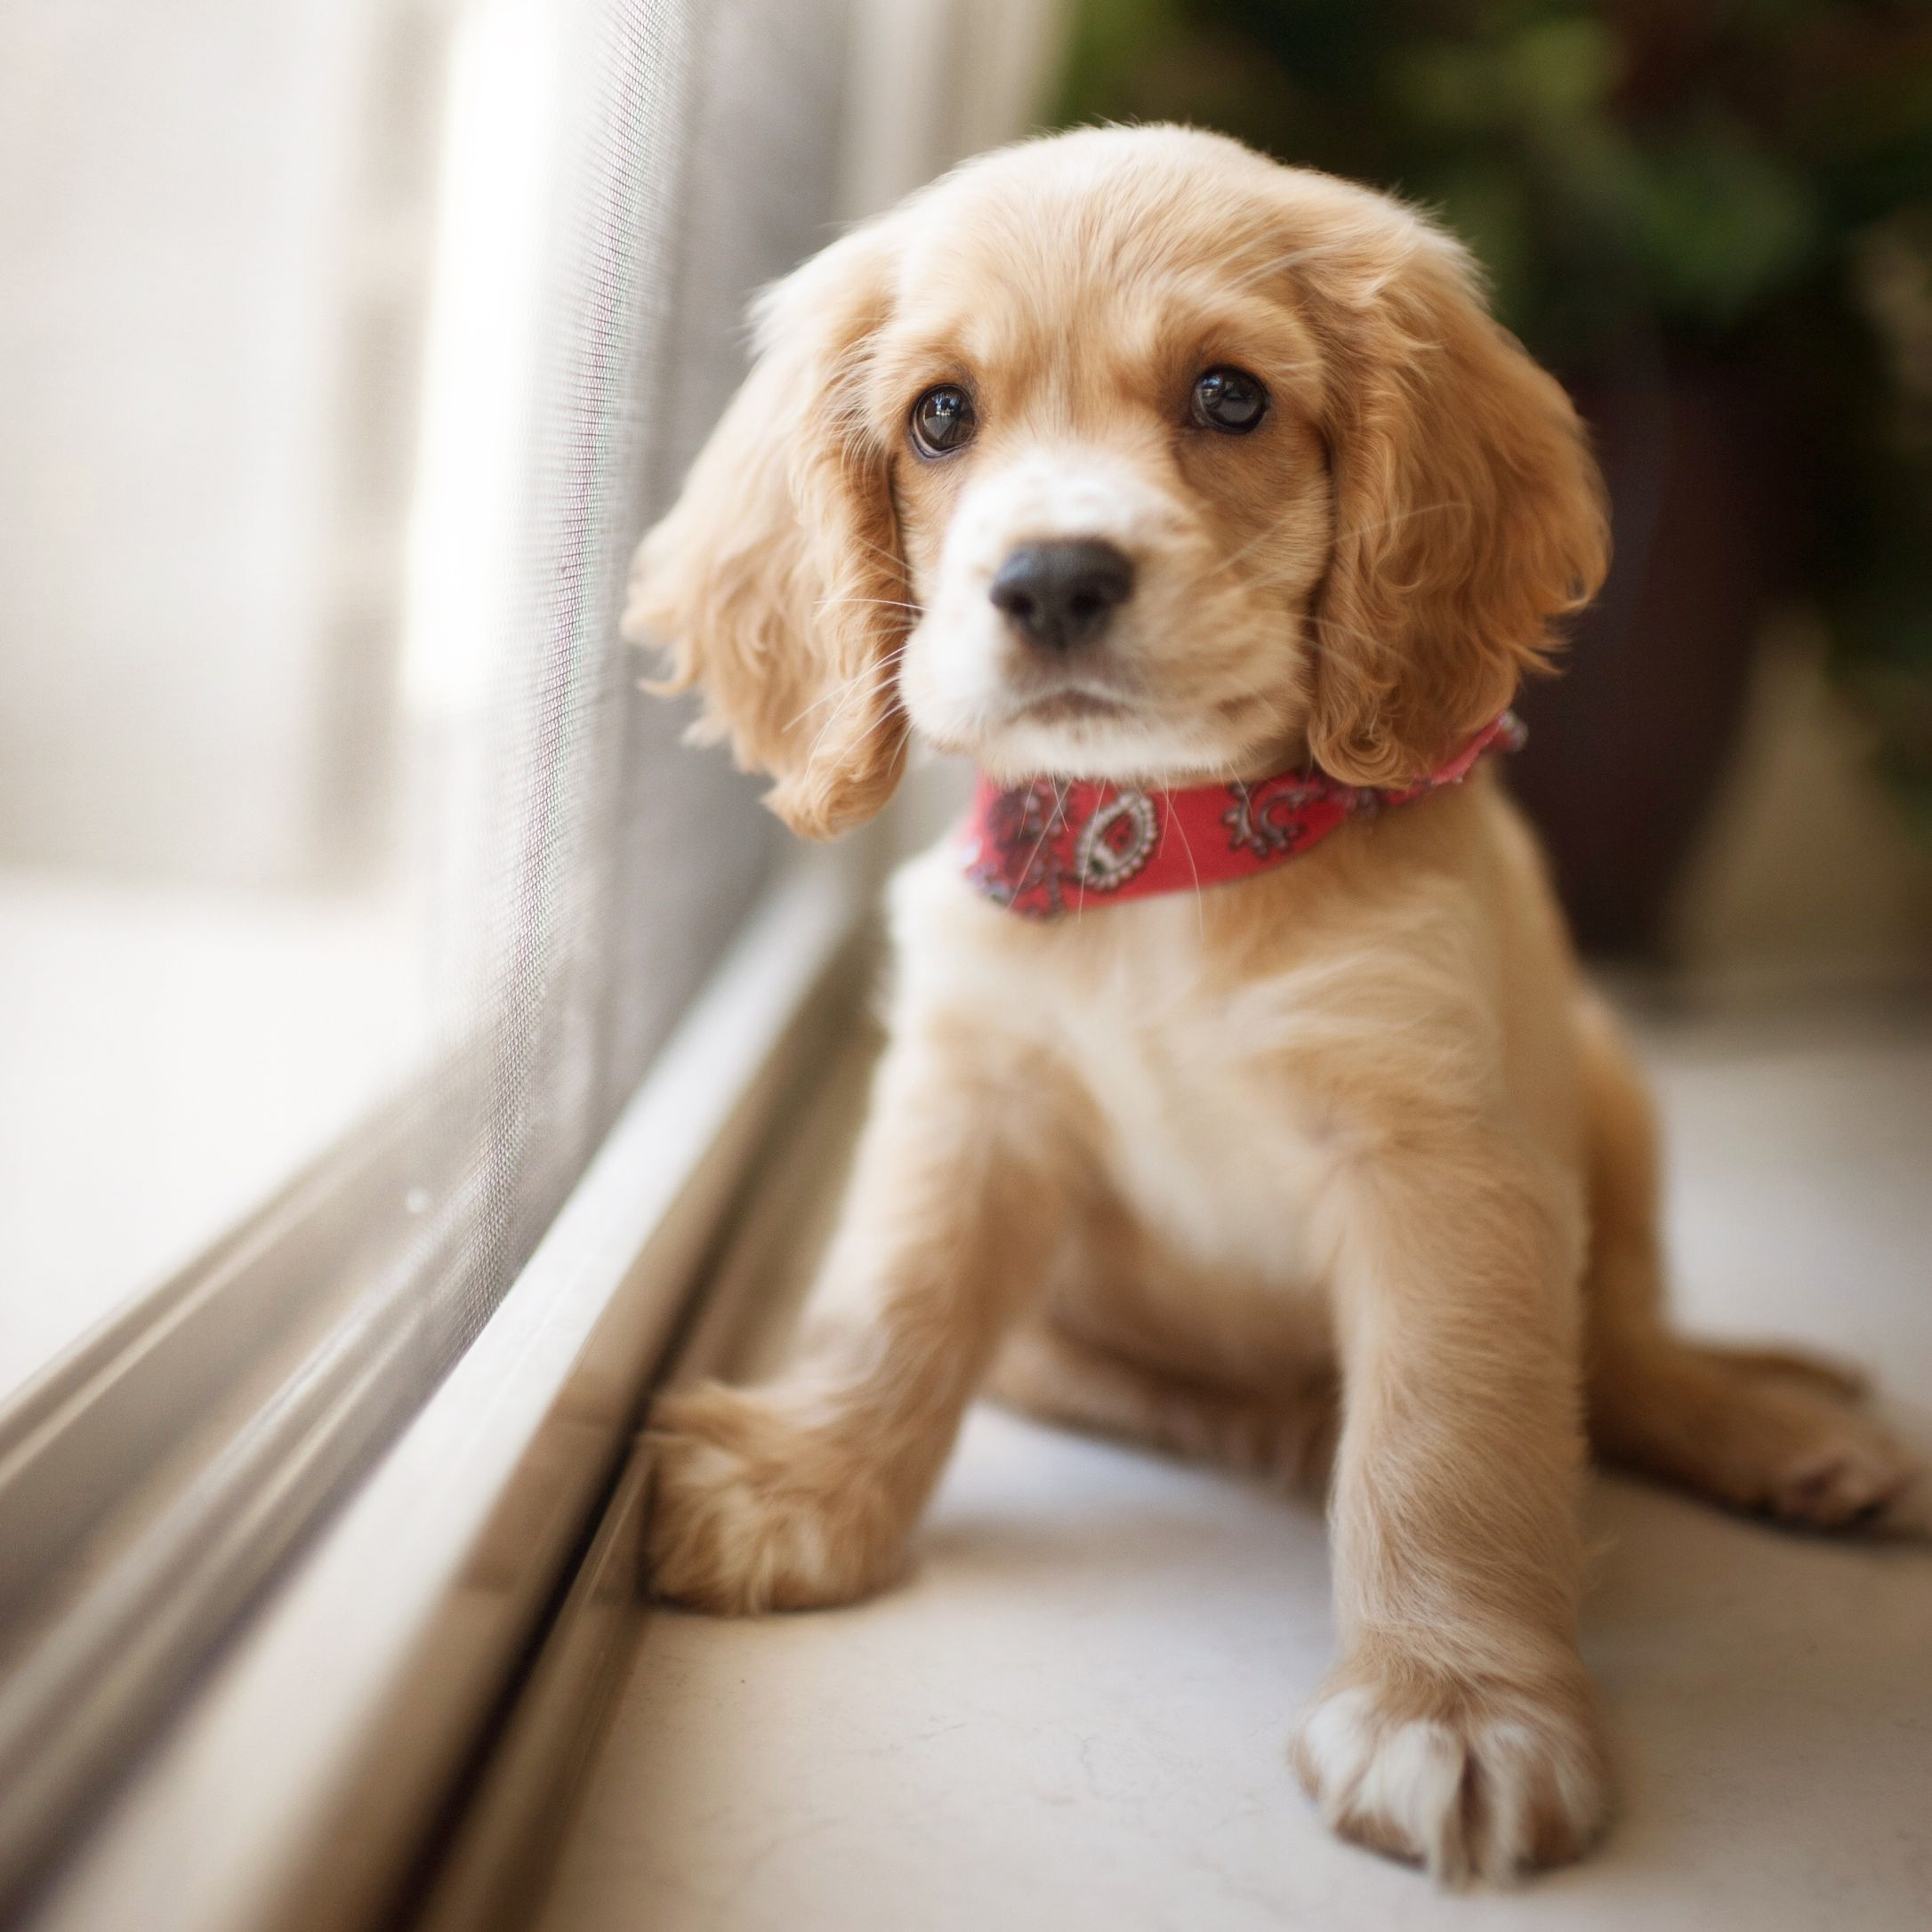 Cocker Spaniel Puppy | pets.....say no more | Pinterest